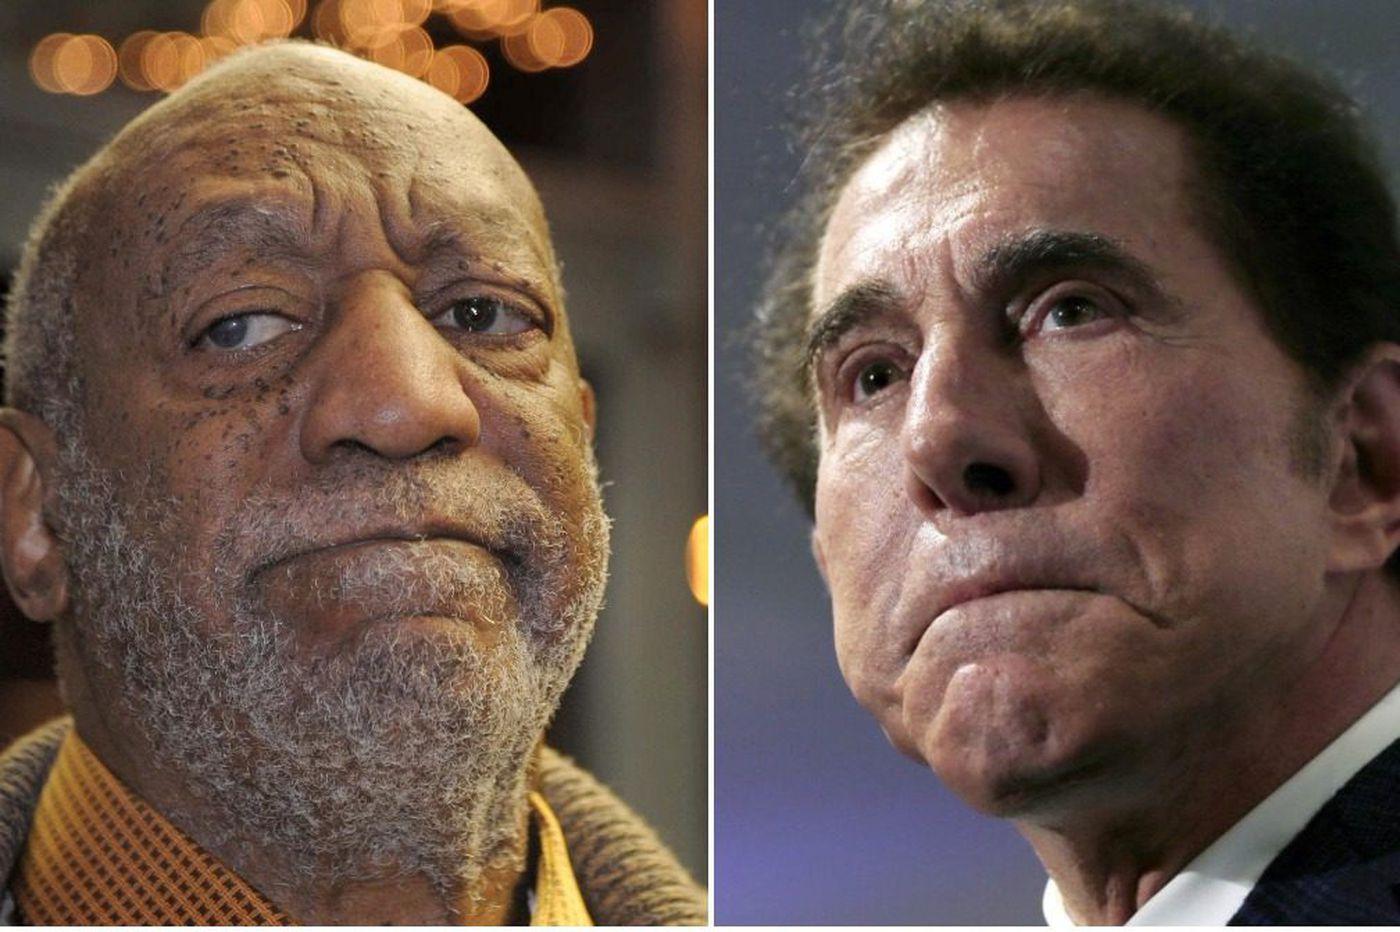 University of Pennsylvania strips Steve Wynn, Bill Cosby of honors